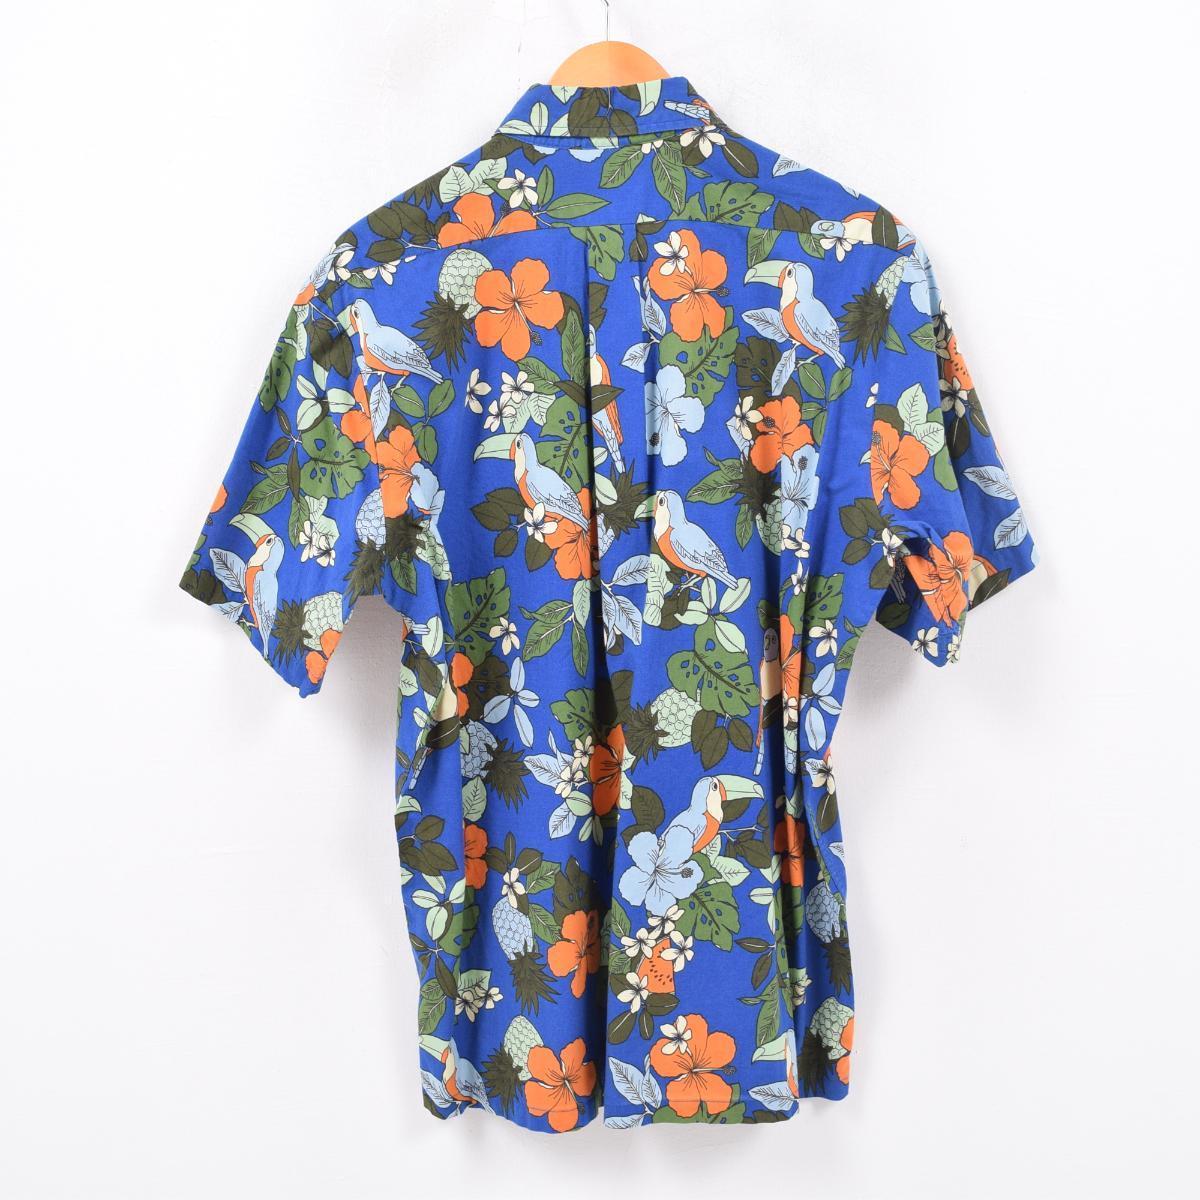 4af1379e レインスプーナー REYNSPOONER JOE KEALOHA'S Joe care Rojas hibiscus pattern whole  pattern pullover Hawaii Ann Hawaiian shirt men L /wbd2265